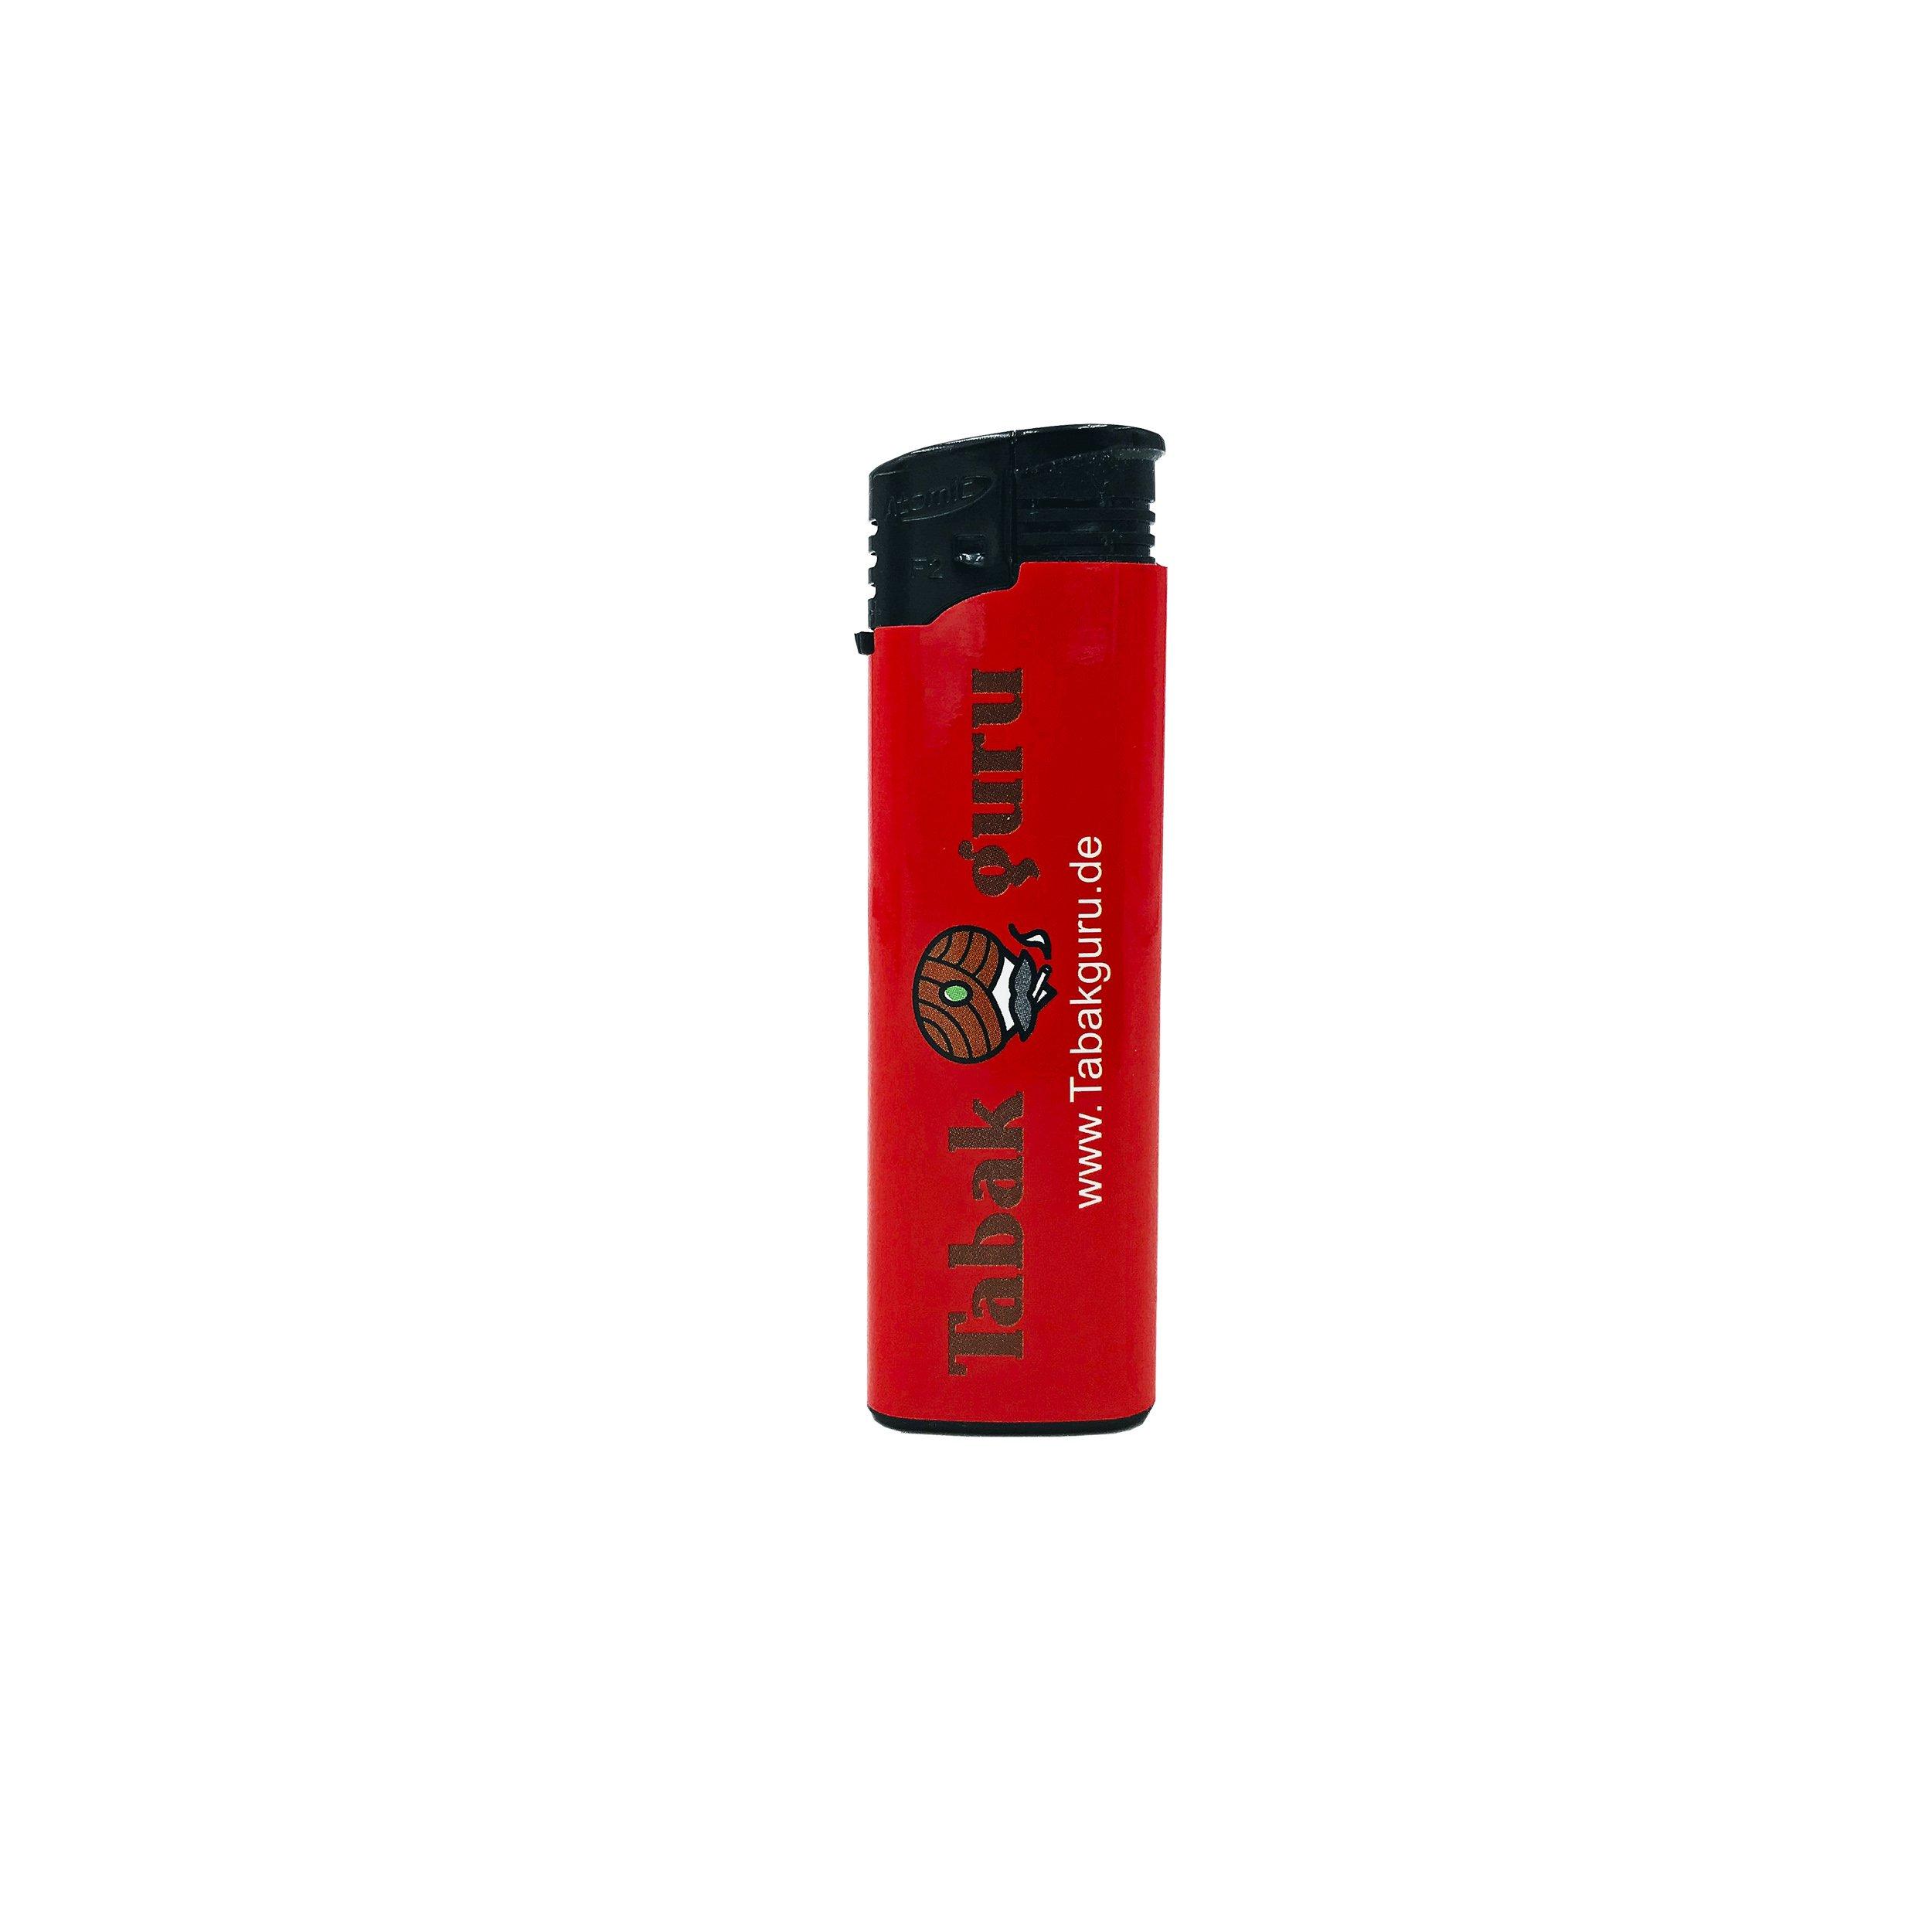 3 x Elixyr Red / Rot Volumentabak 330g + 2.000 Hülsen wählbar + Feuerzeuge